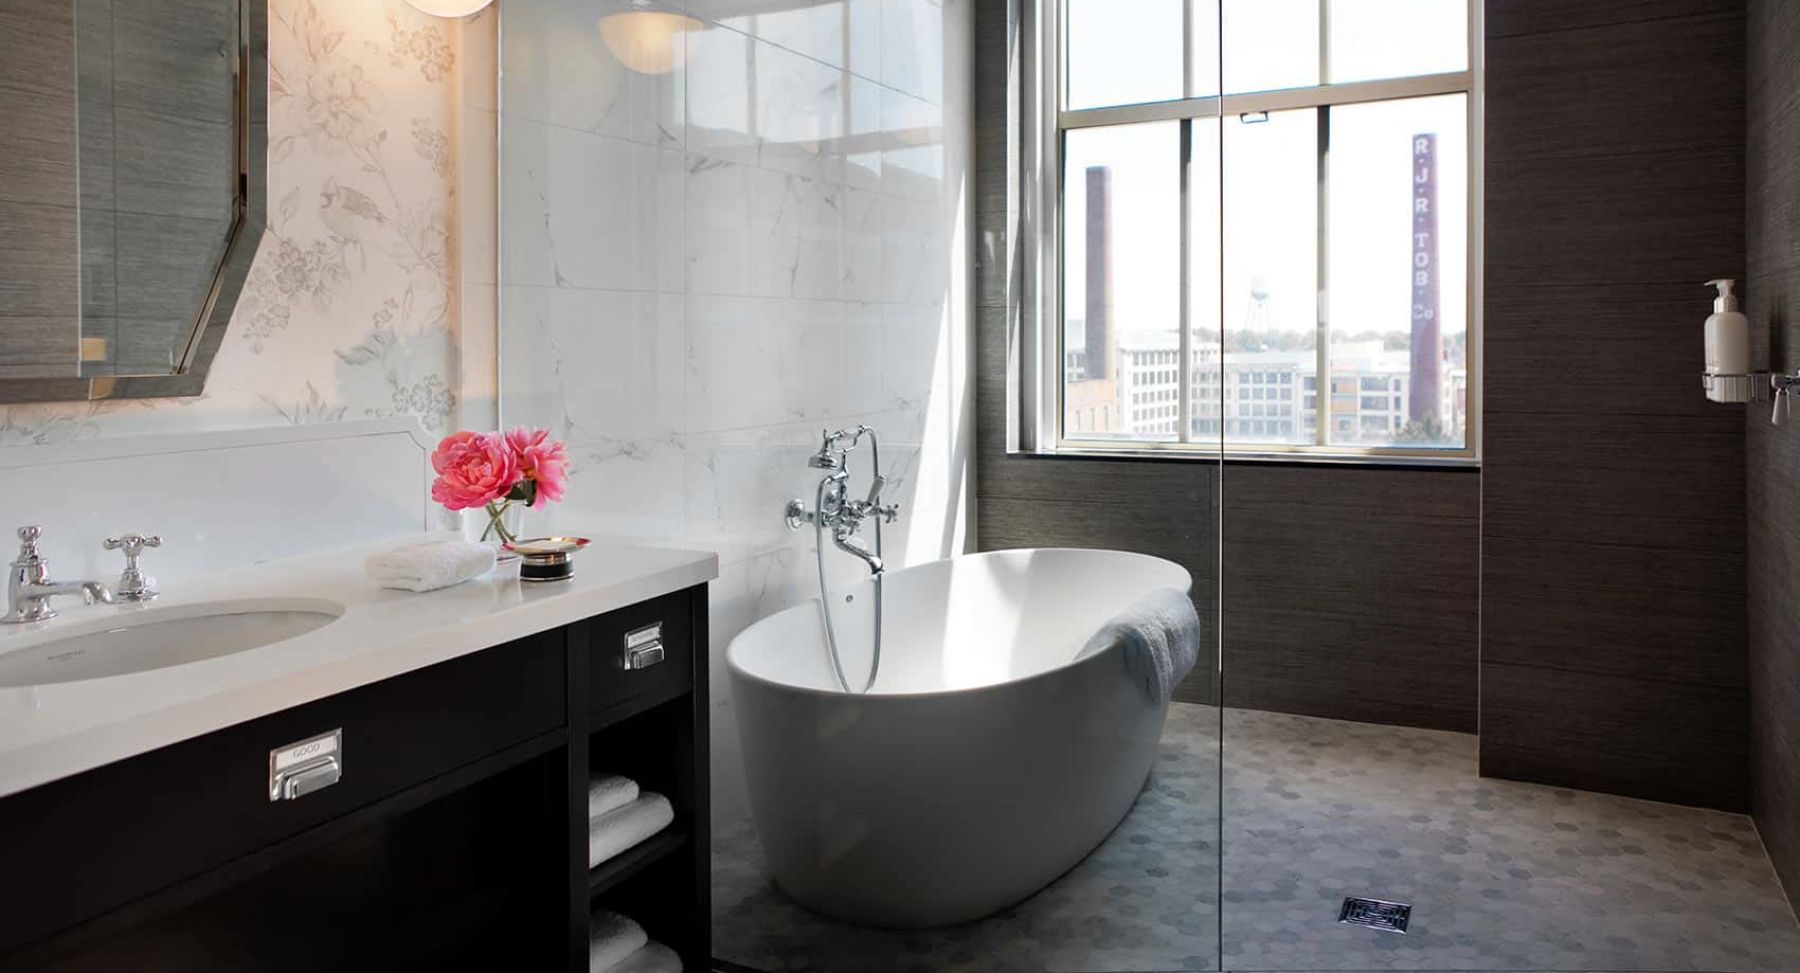 Dorable Carolina Classic Tubs Illustration - Bathroom and Shower ...